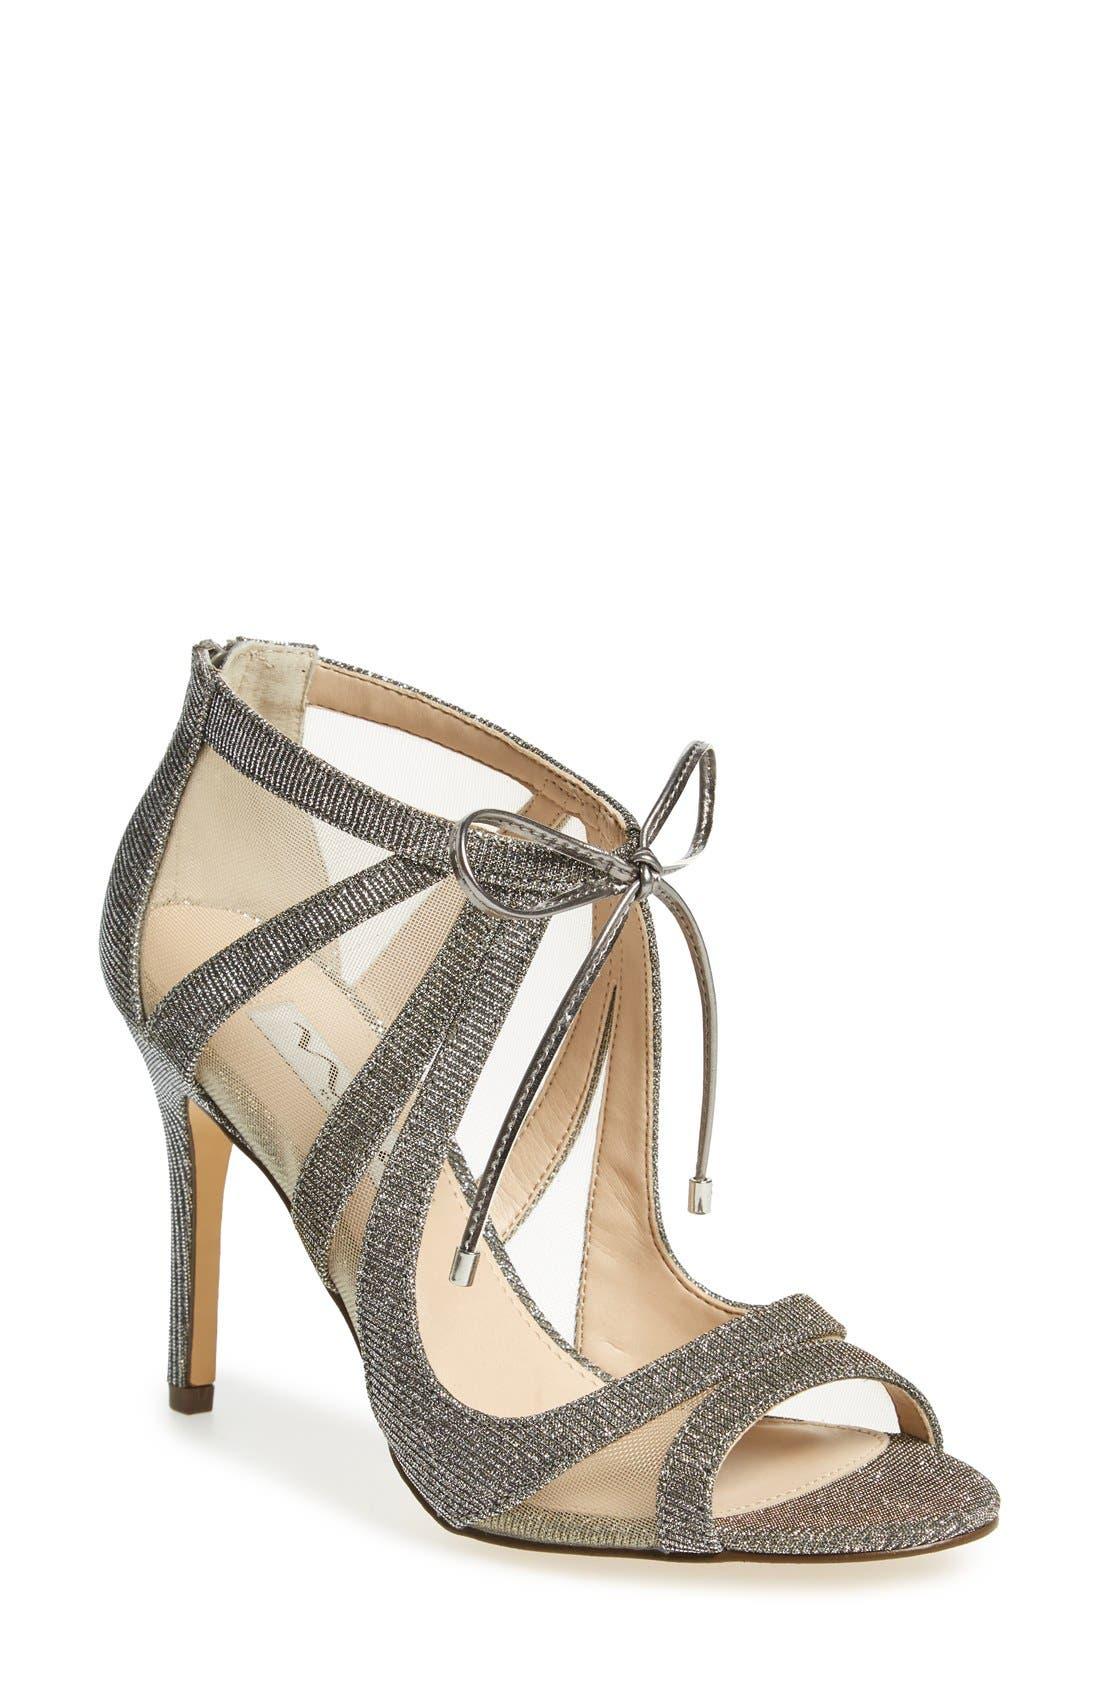 Cherie Illusion Sandal,                             Main thumbnail 1, color,                             Steel/ Silver